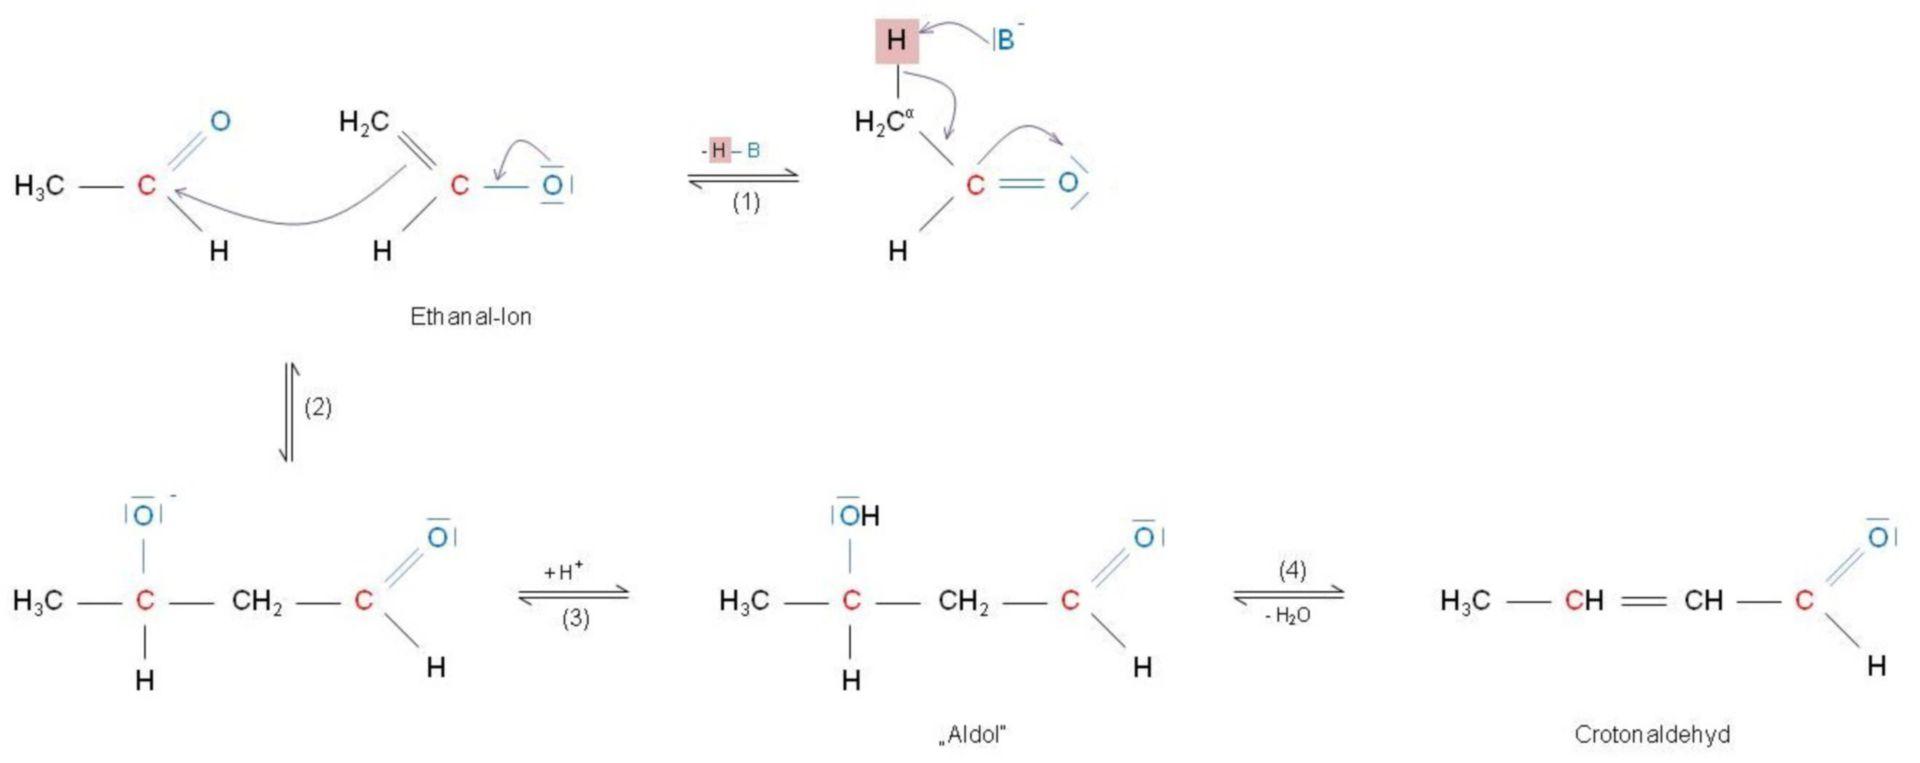 Alcohol condensation to crotonic aldehyde